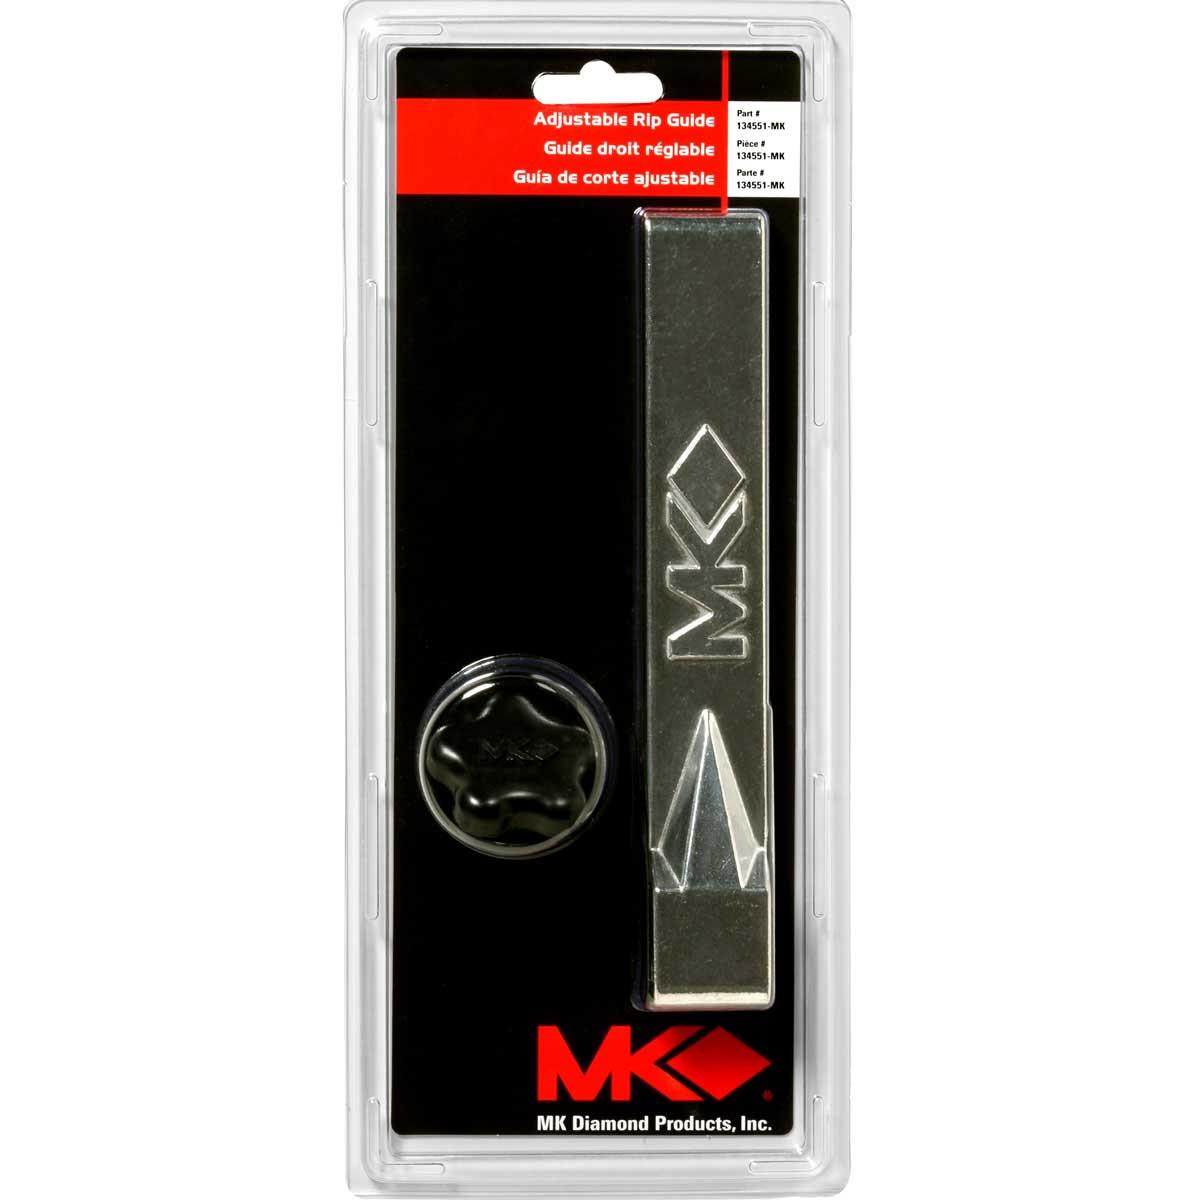 Adjustable Rip Guide for MK Tile Saws